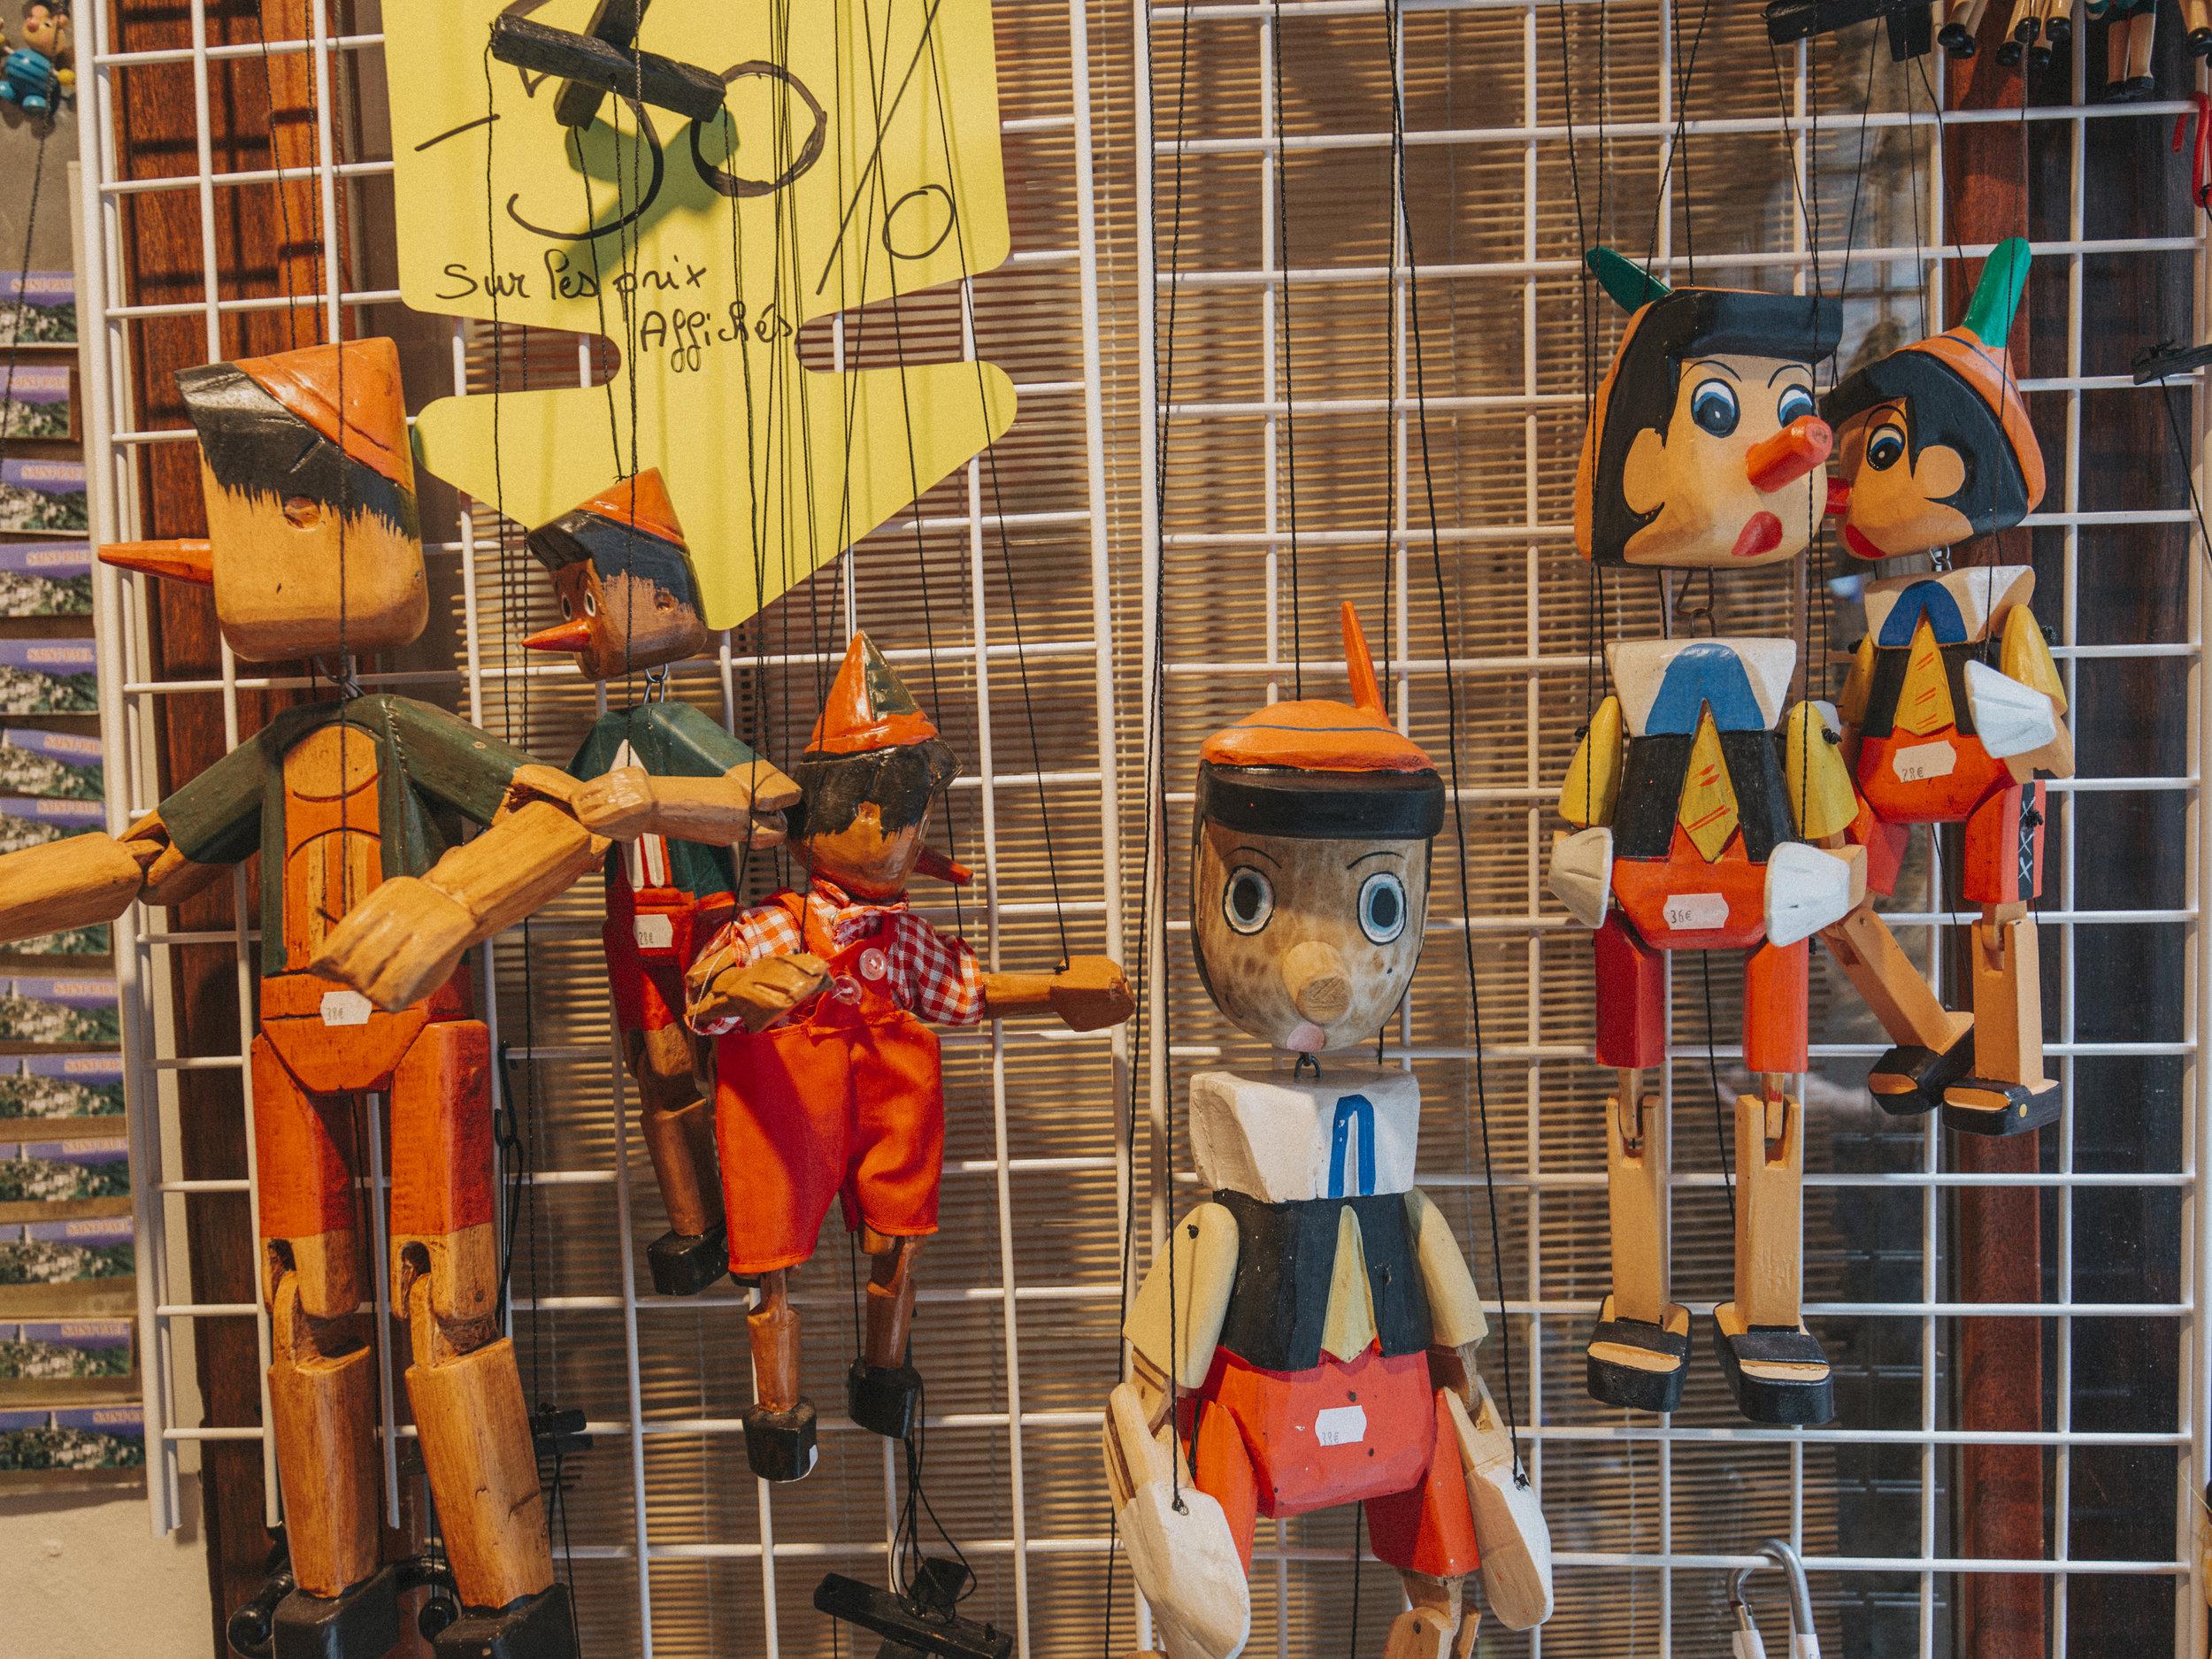 Pinnochio puppets